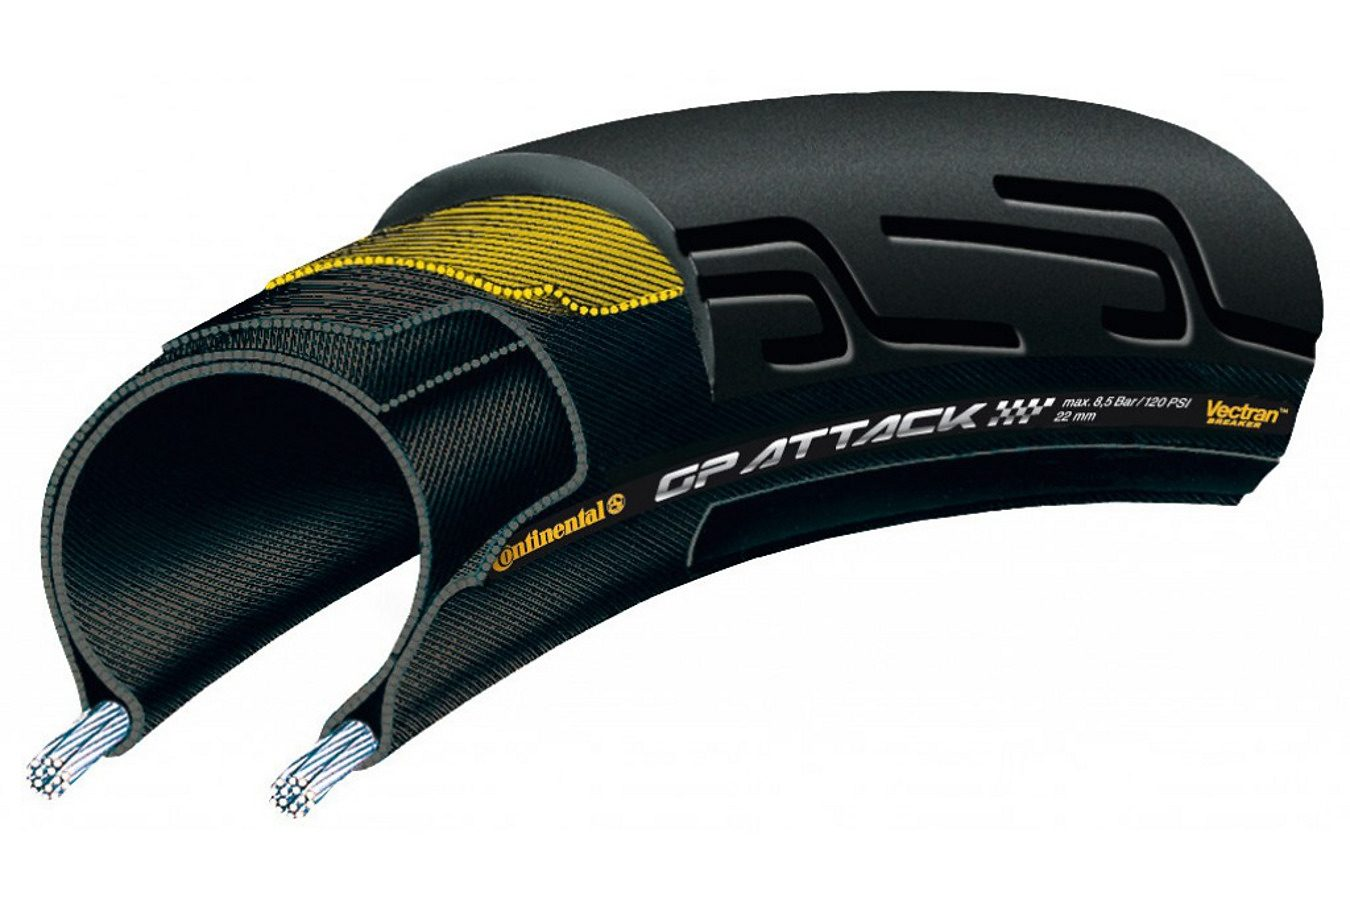 Continental Fahrradreifen »Grand Prix Attack II 22-622 faltbar«